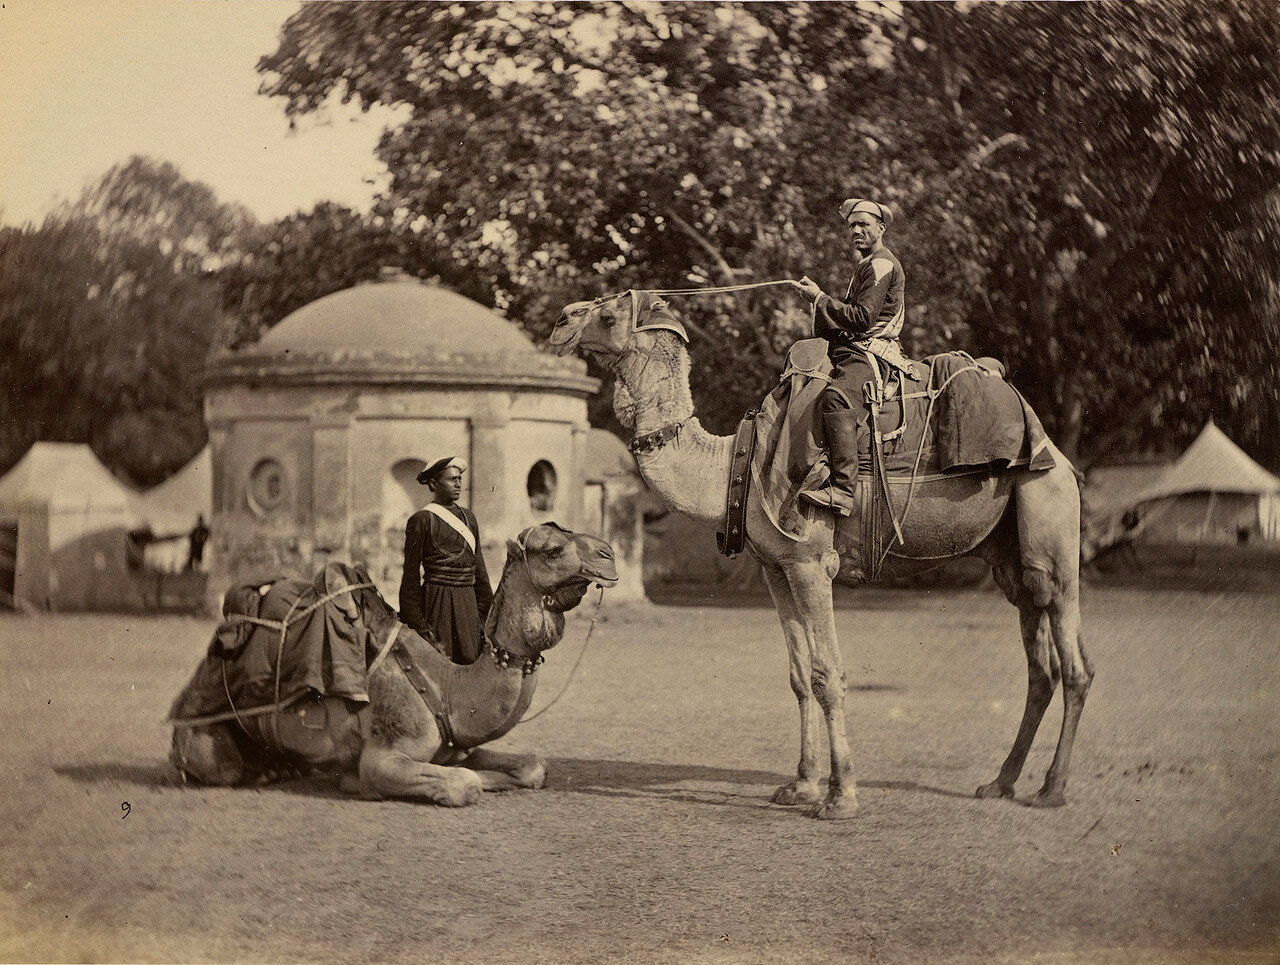 28. Ординарцы принца Уэльского на верблюдах